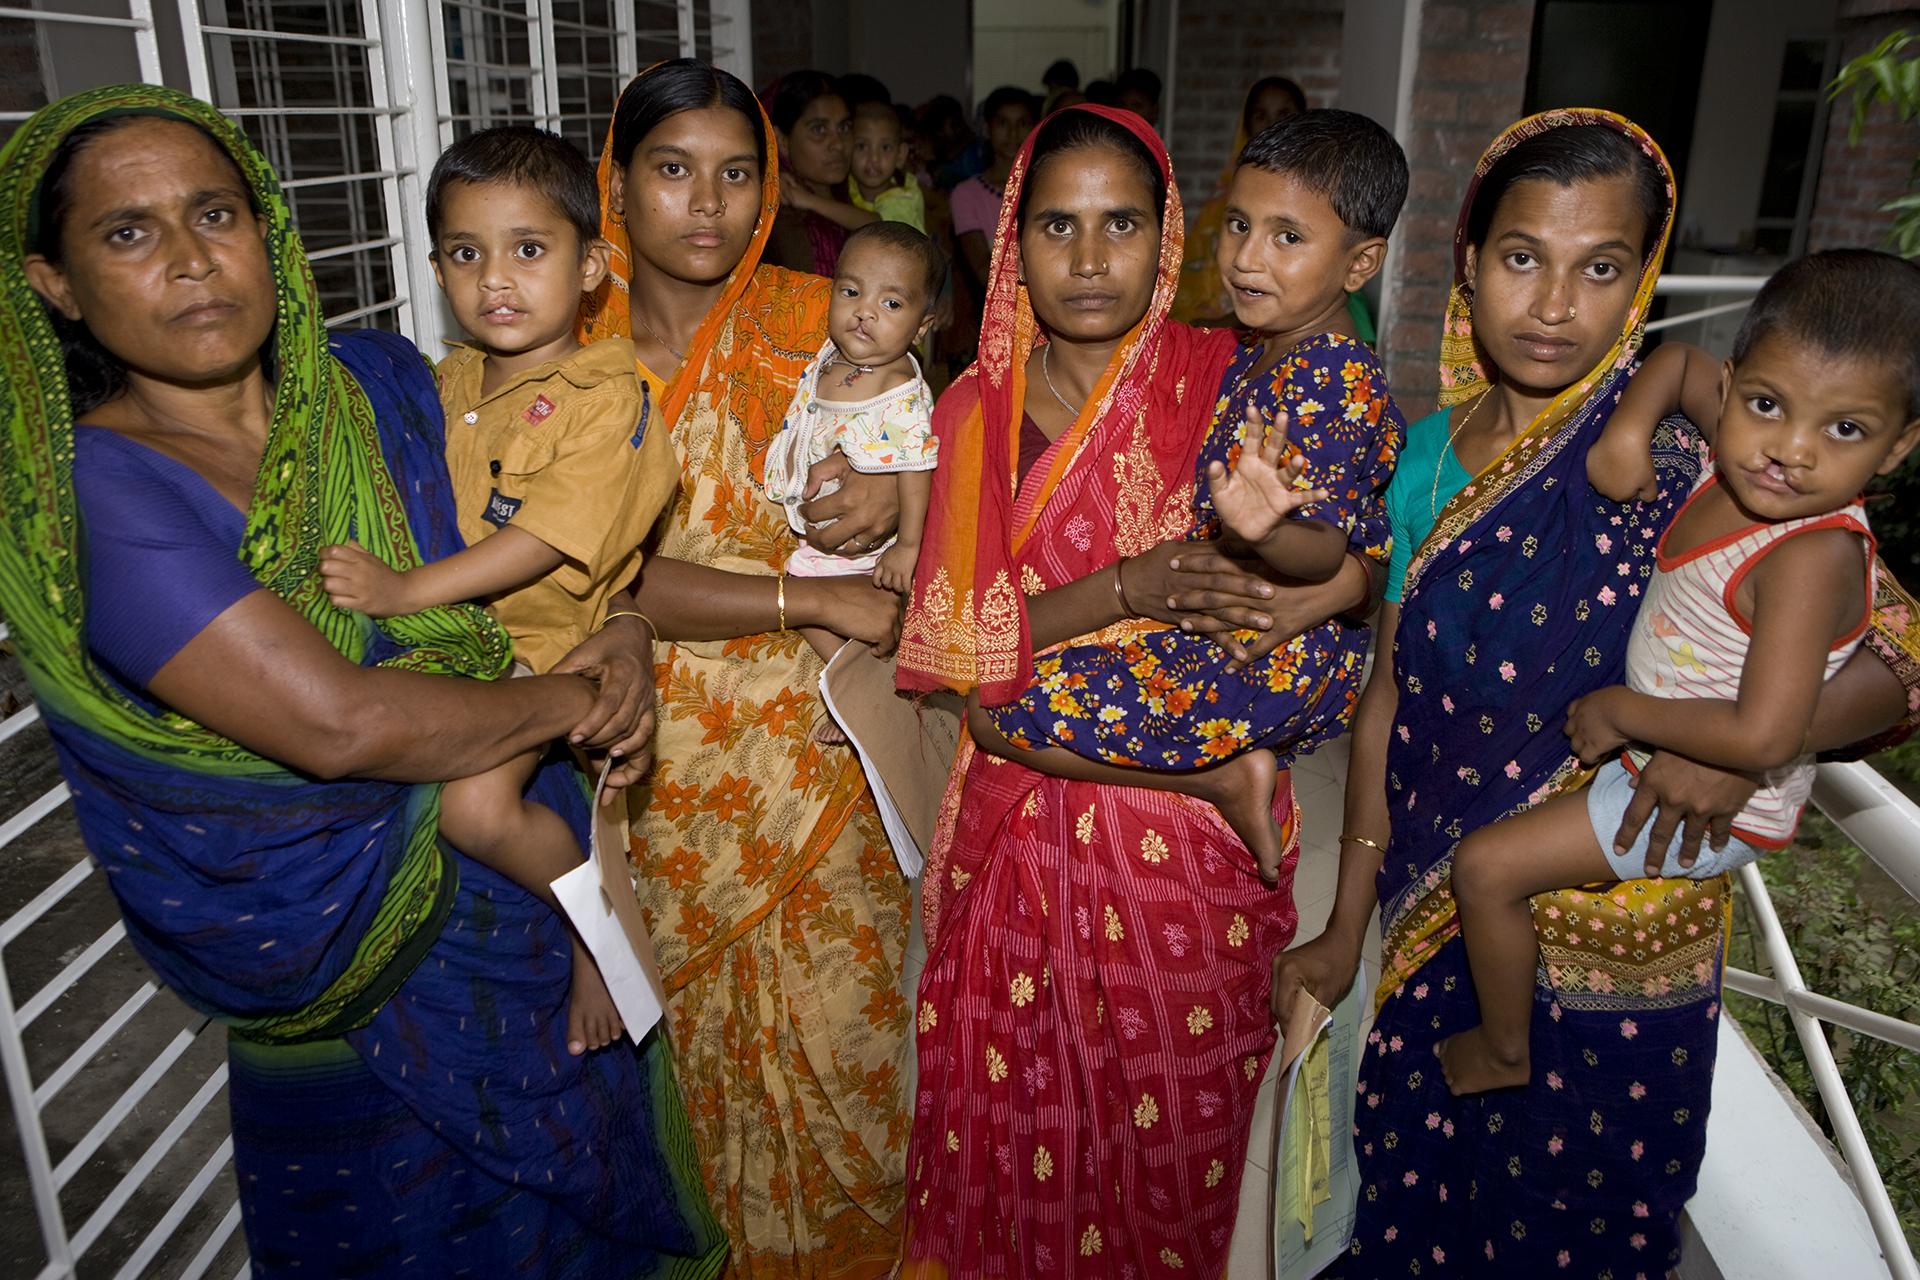 bangladesh-cleft-mission-bang-07-doc-120Q0744.jpg